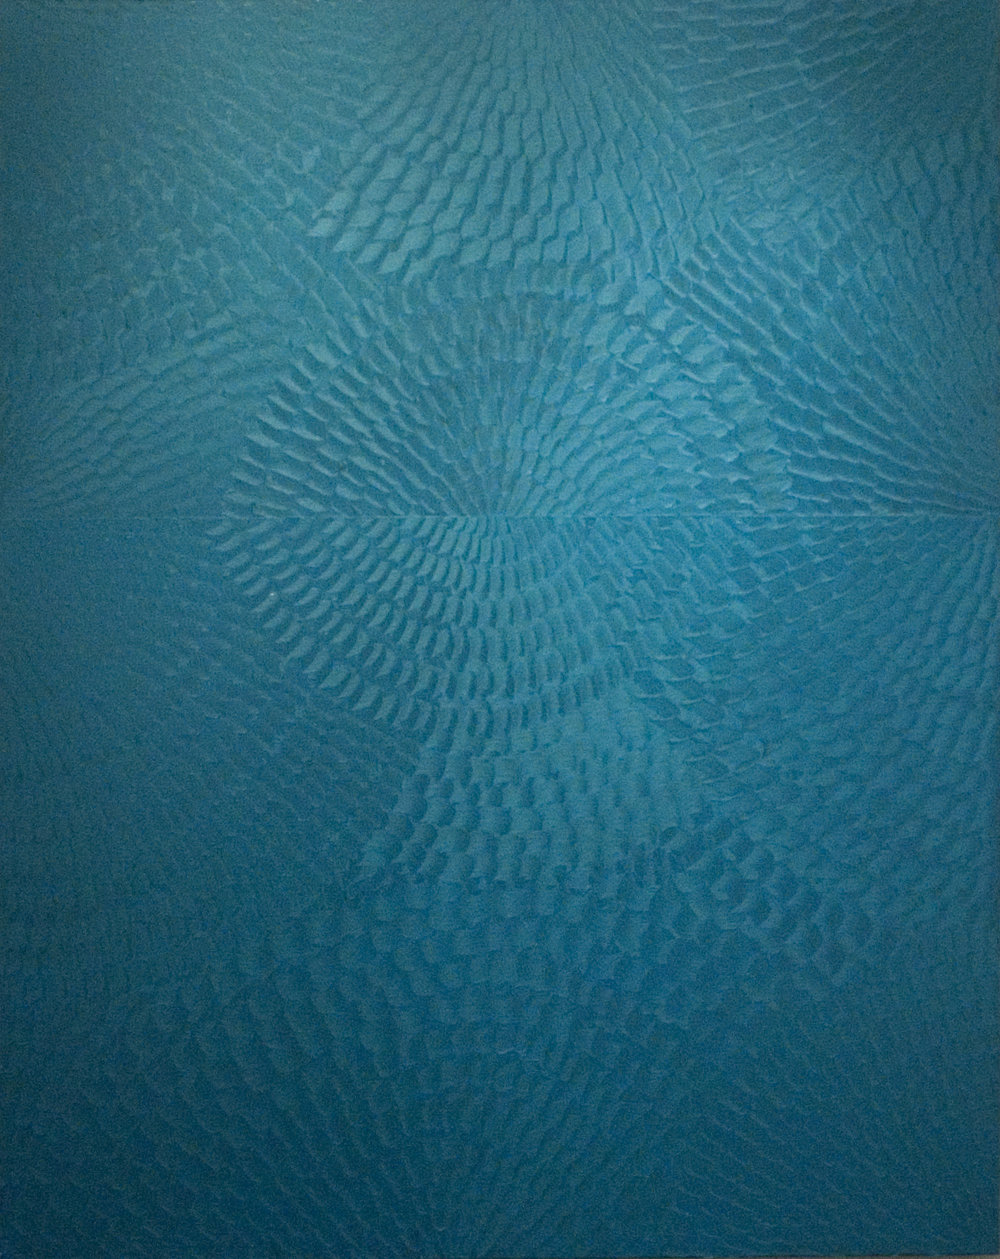 Danny Williams  Aegean  48x60  oil on canvas